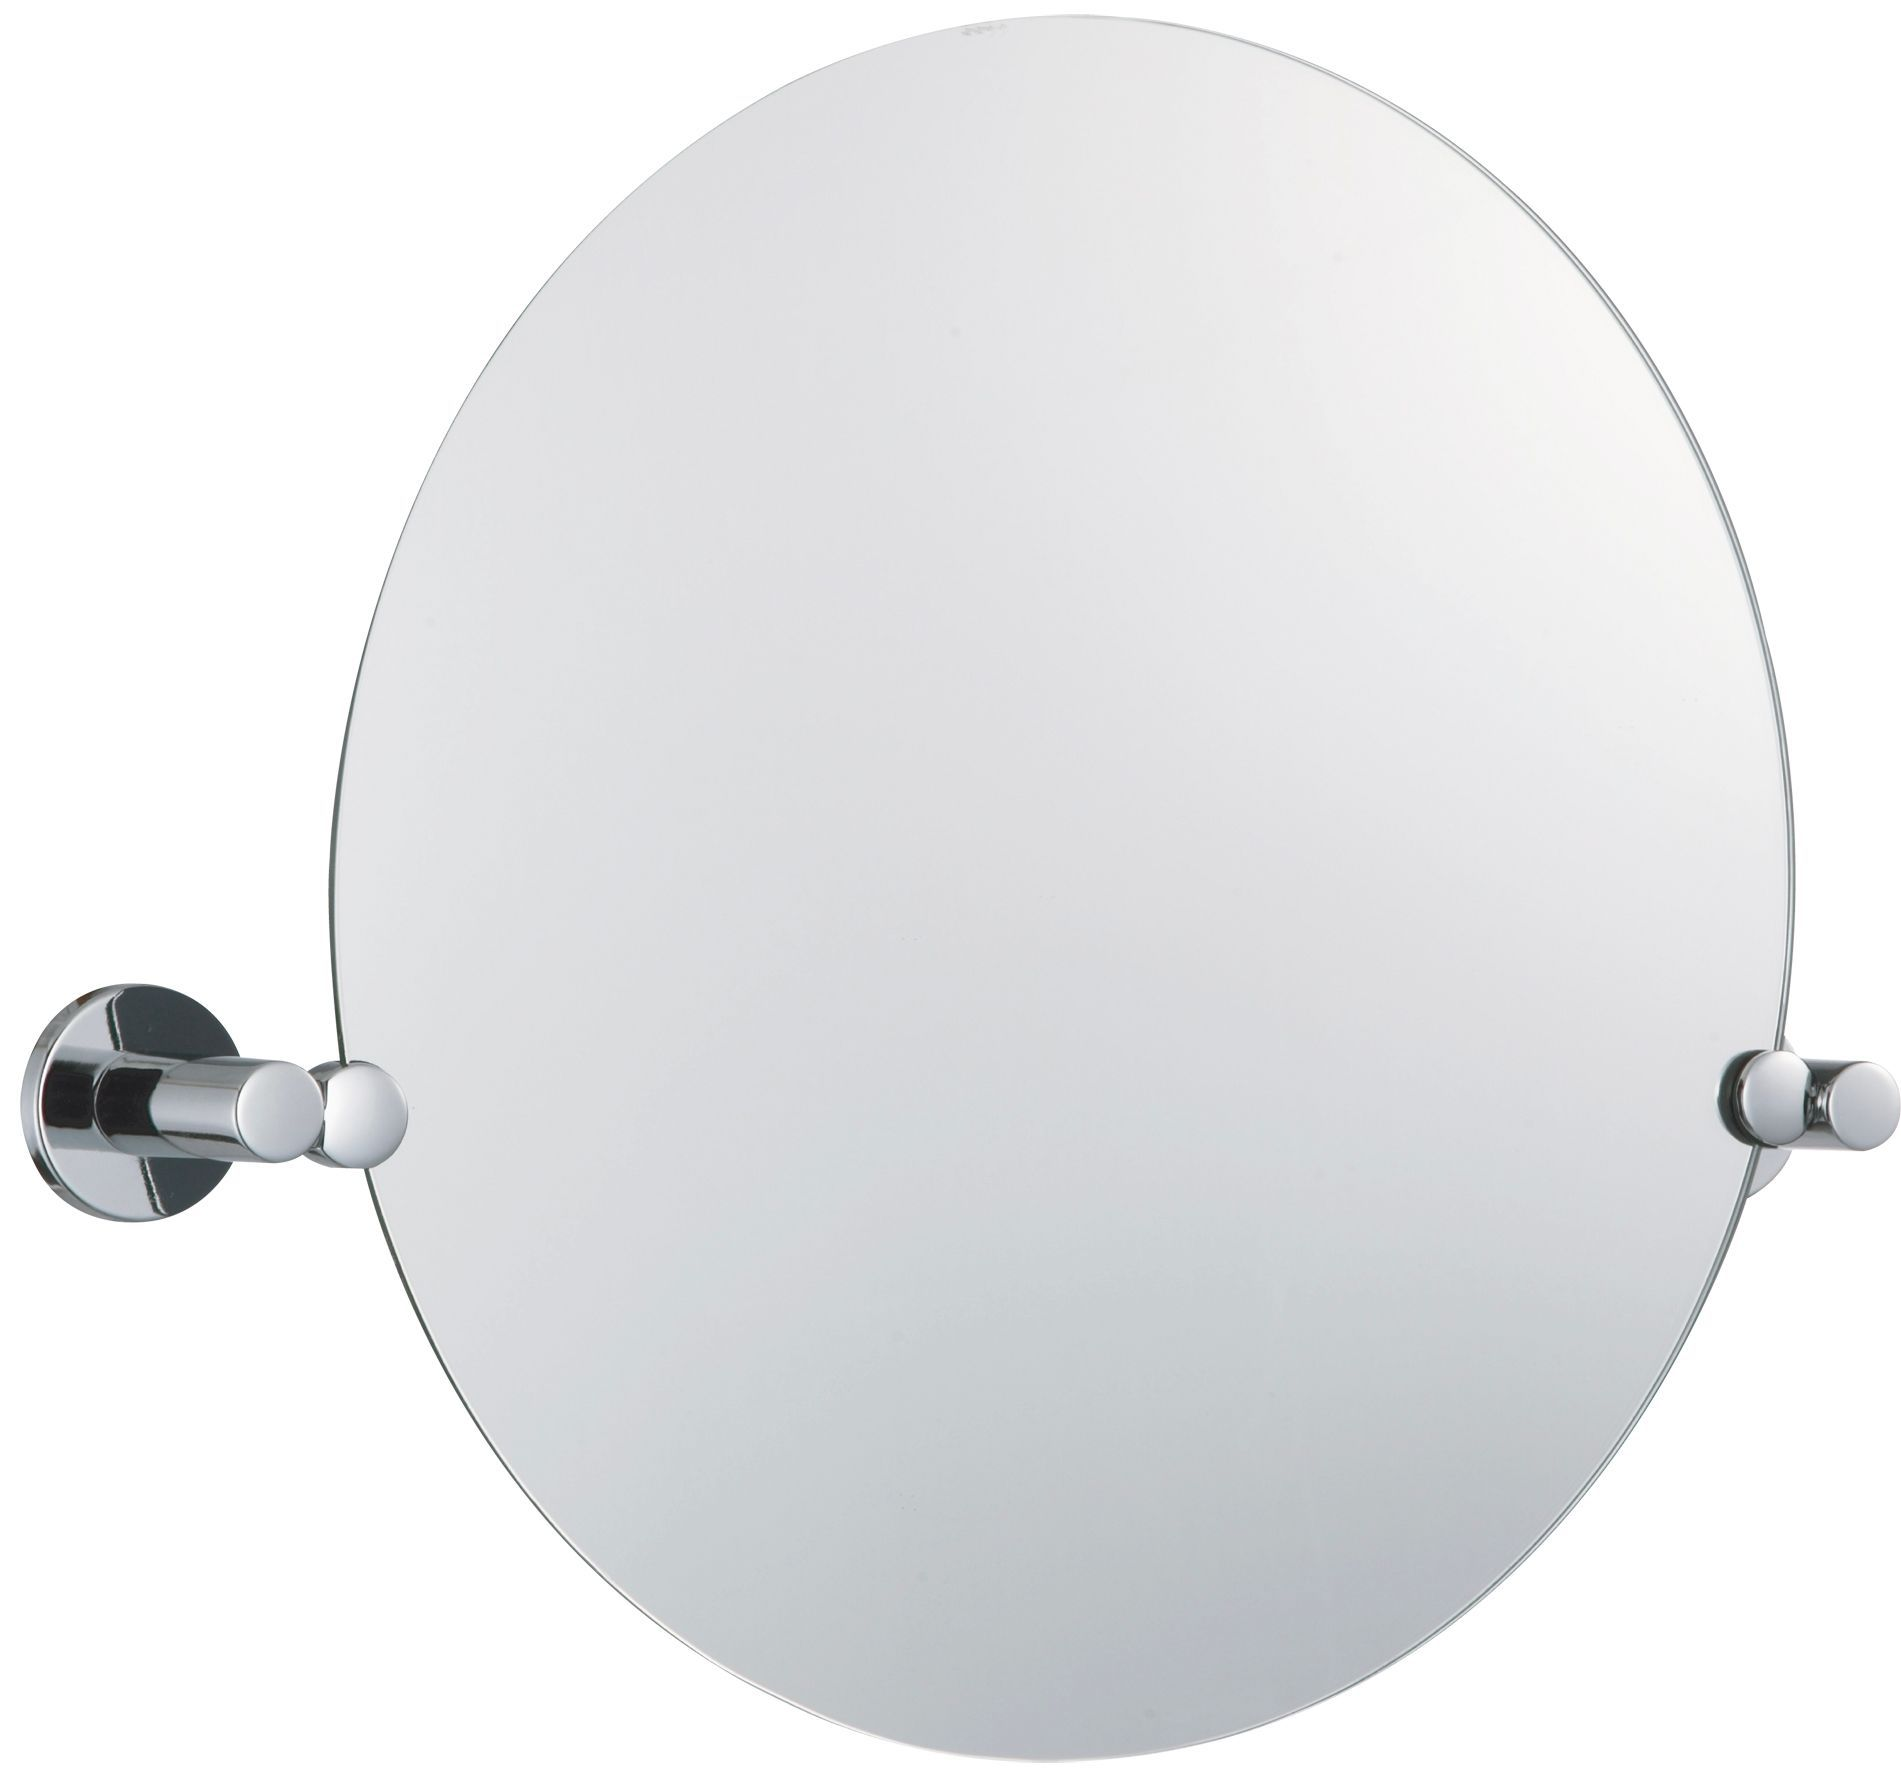 Bathroom Mirror Lights B&Q b&q cirque circular wall mirror (w)450mm (h)550mm | departments